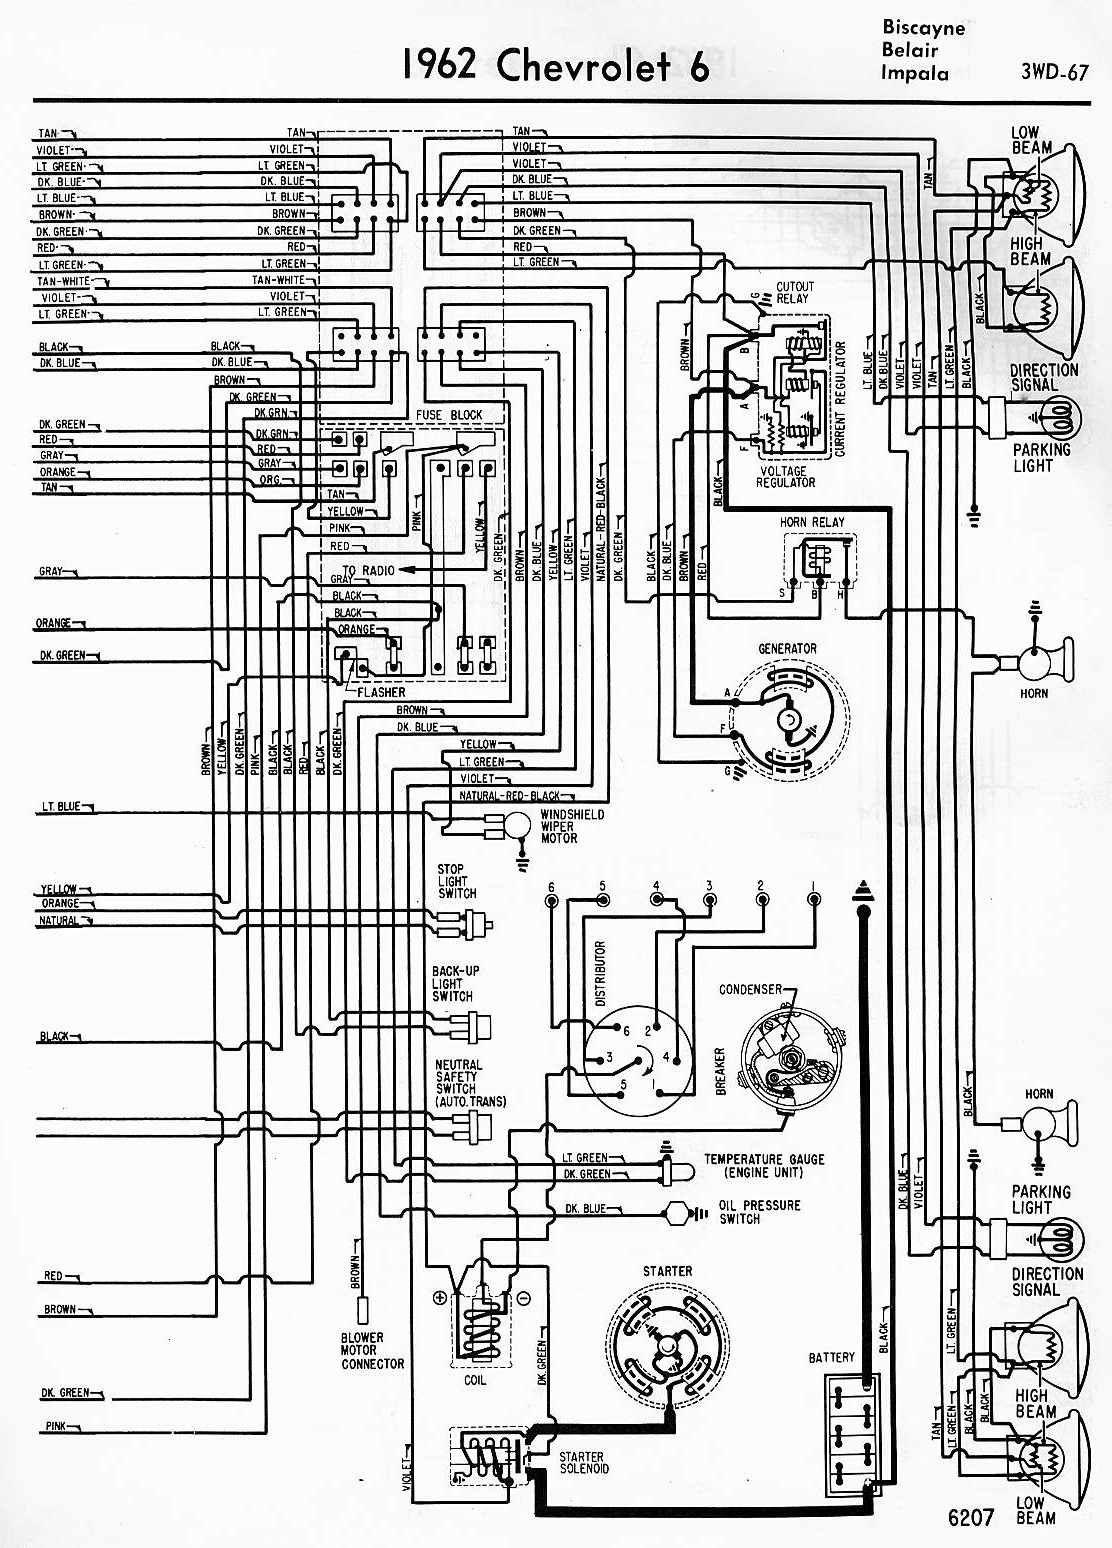 20 Auto Wiring Diagrams For You Https Bacamajalah Com 20 Auto Wiring Diagrams For You Au Electrical Wiring Diagram Trailer Wiring Diagram Chevy Impala